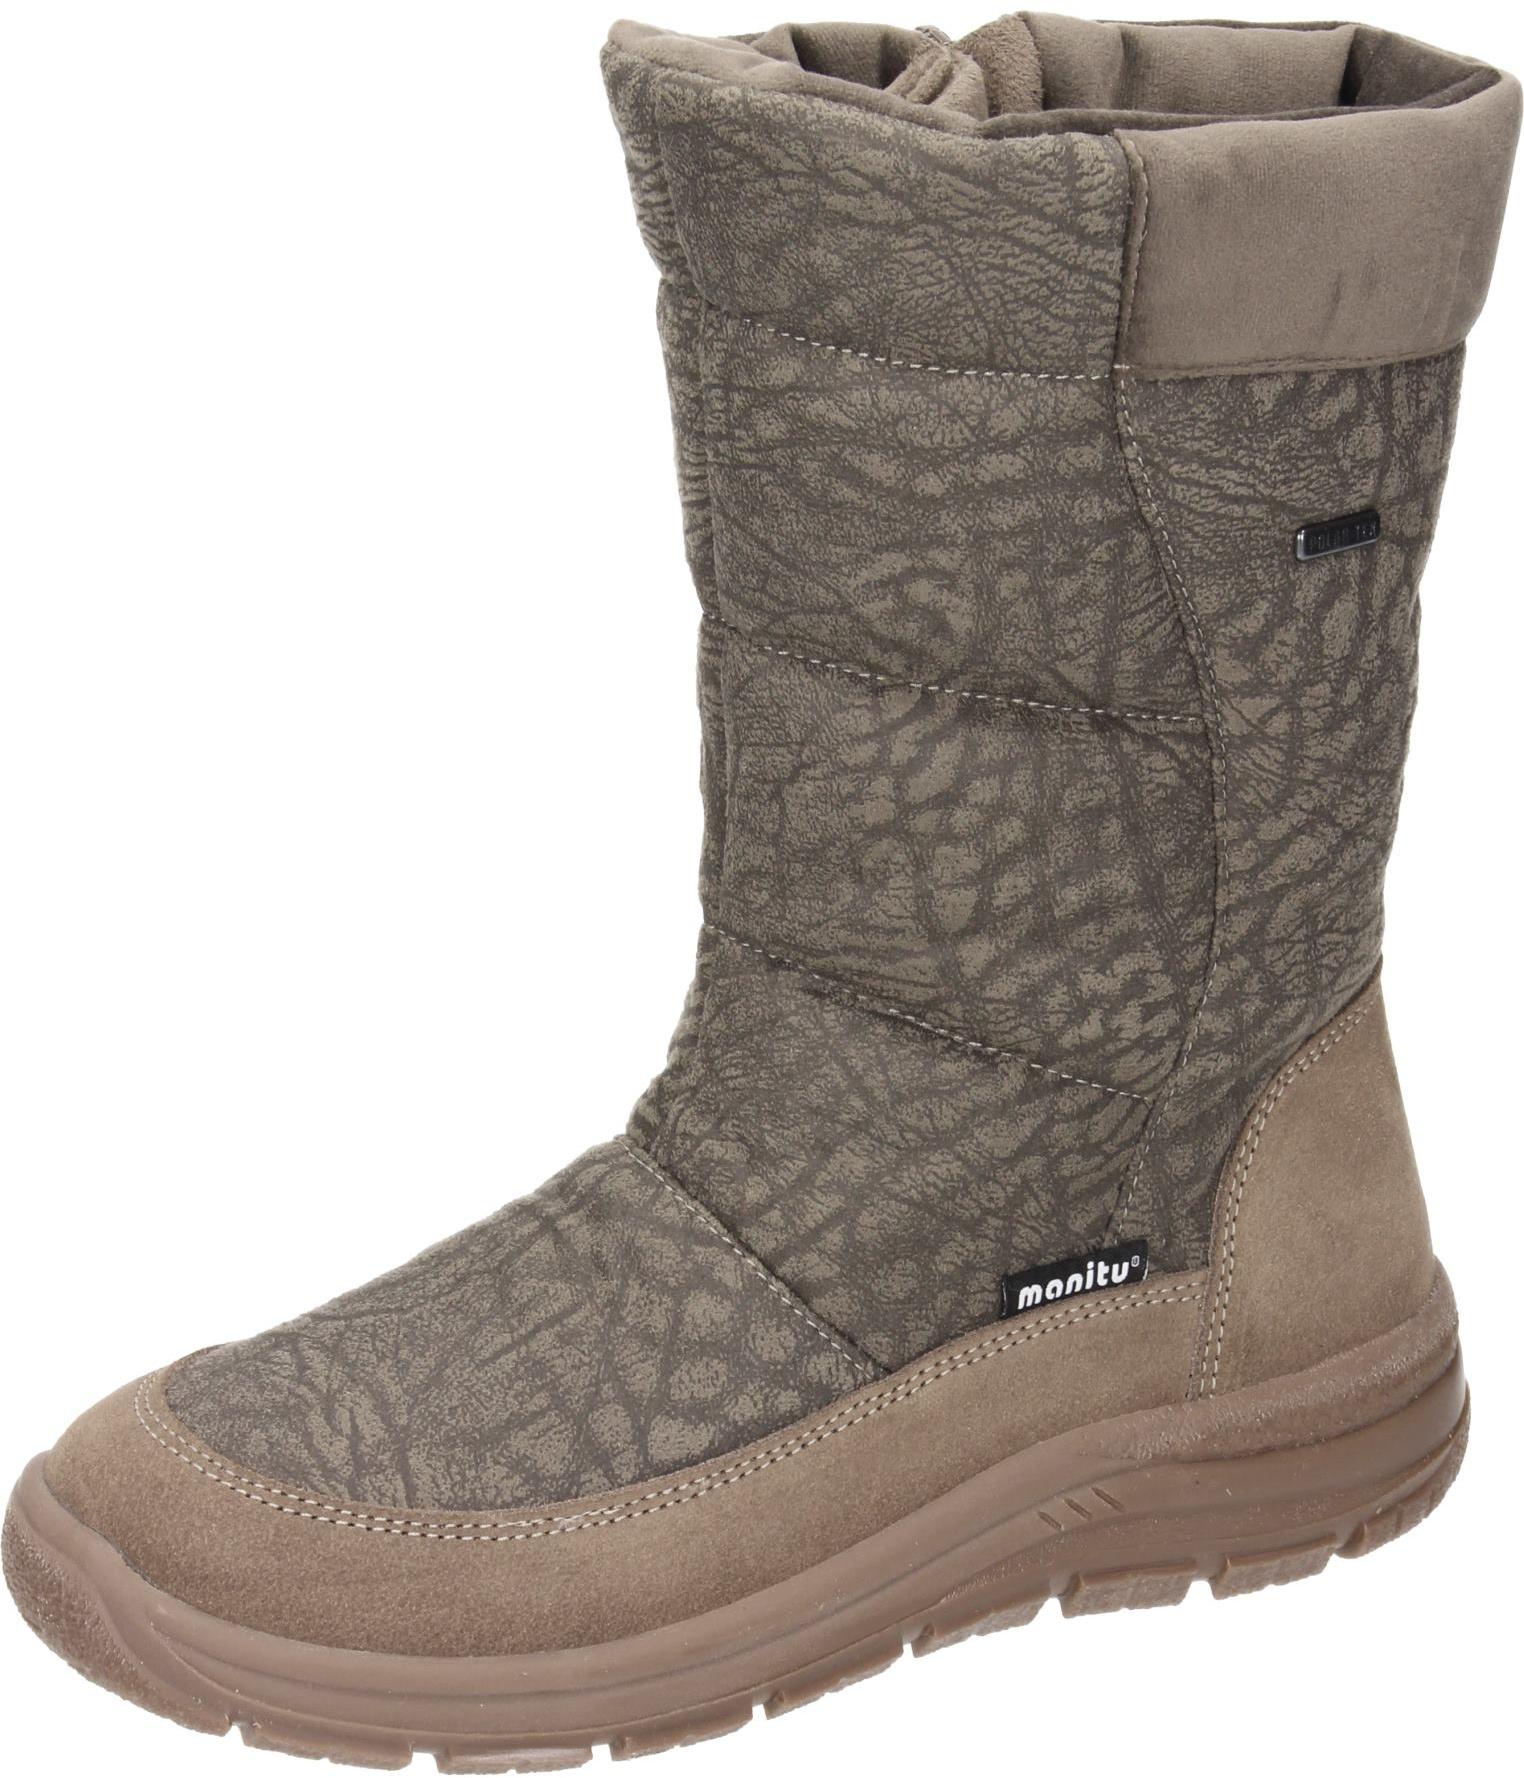 Polar-Tex Damen Schuhe Damen-Stiefel braun Synthetik NEU